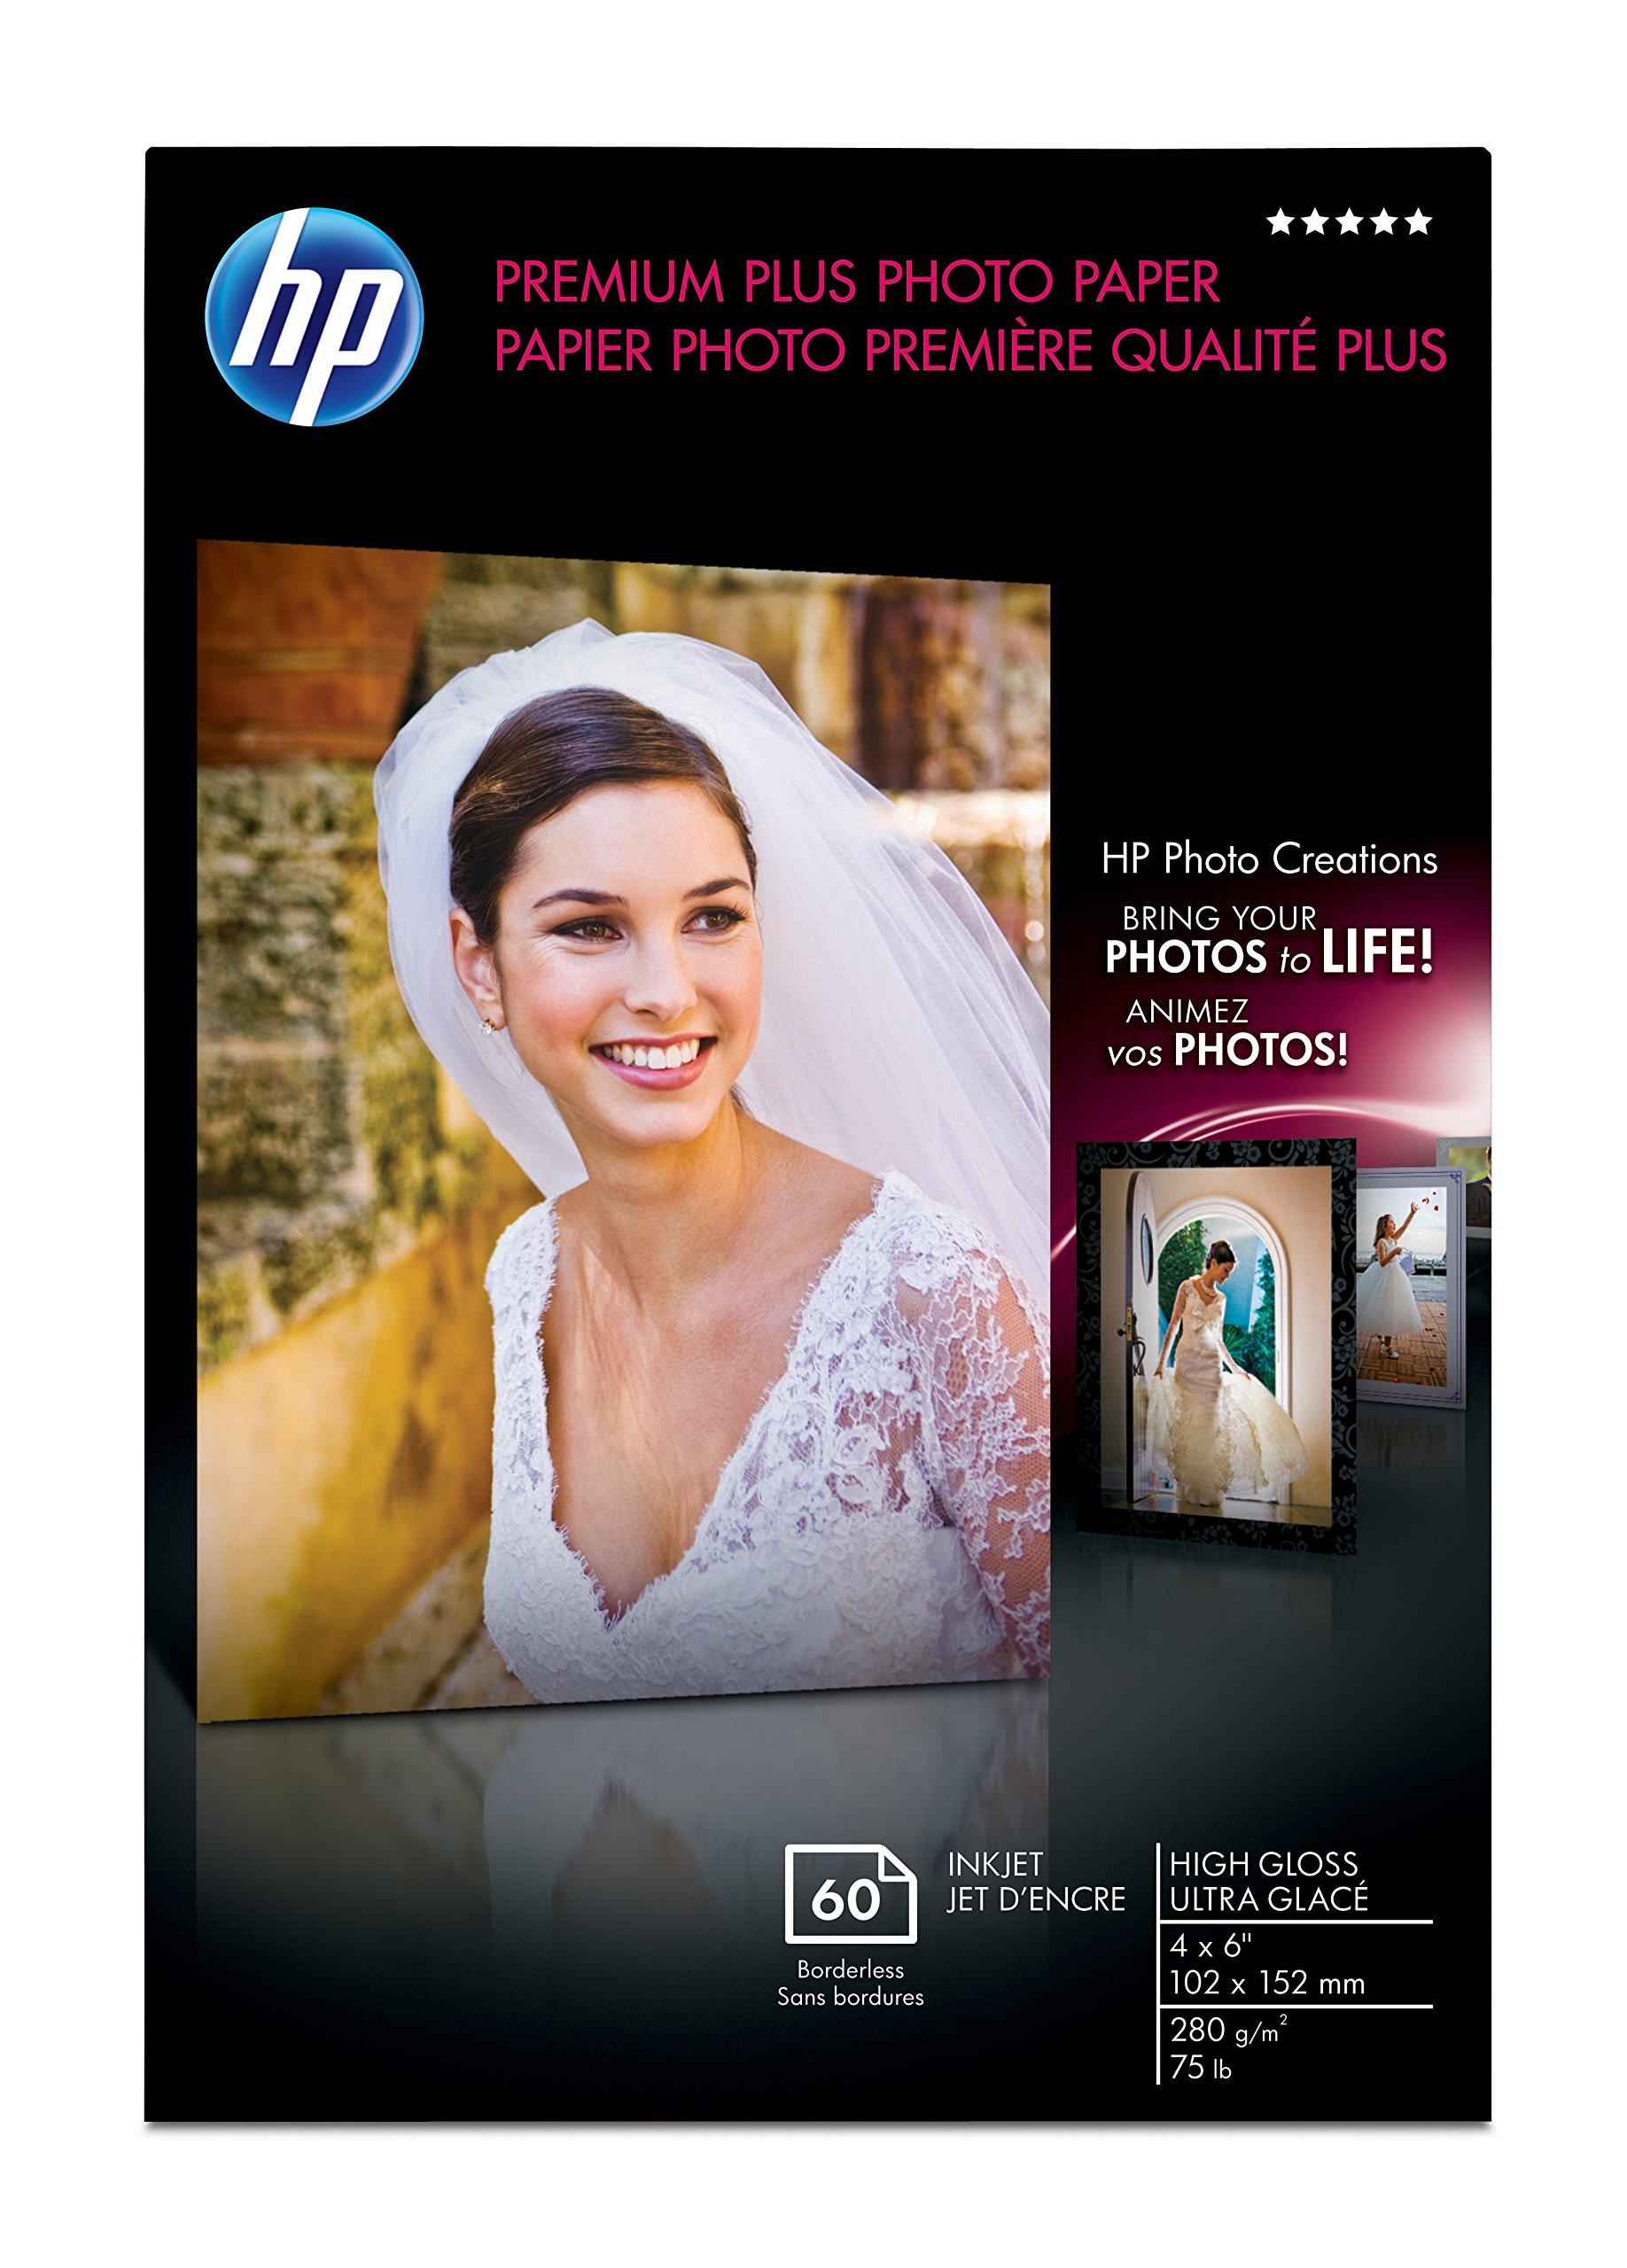 HP Premium Plus Photo Paper, High Gloss (60 Sheets, 4 x 6 Inches borderless)